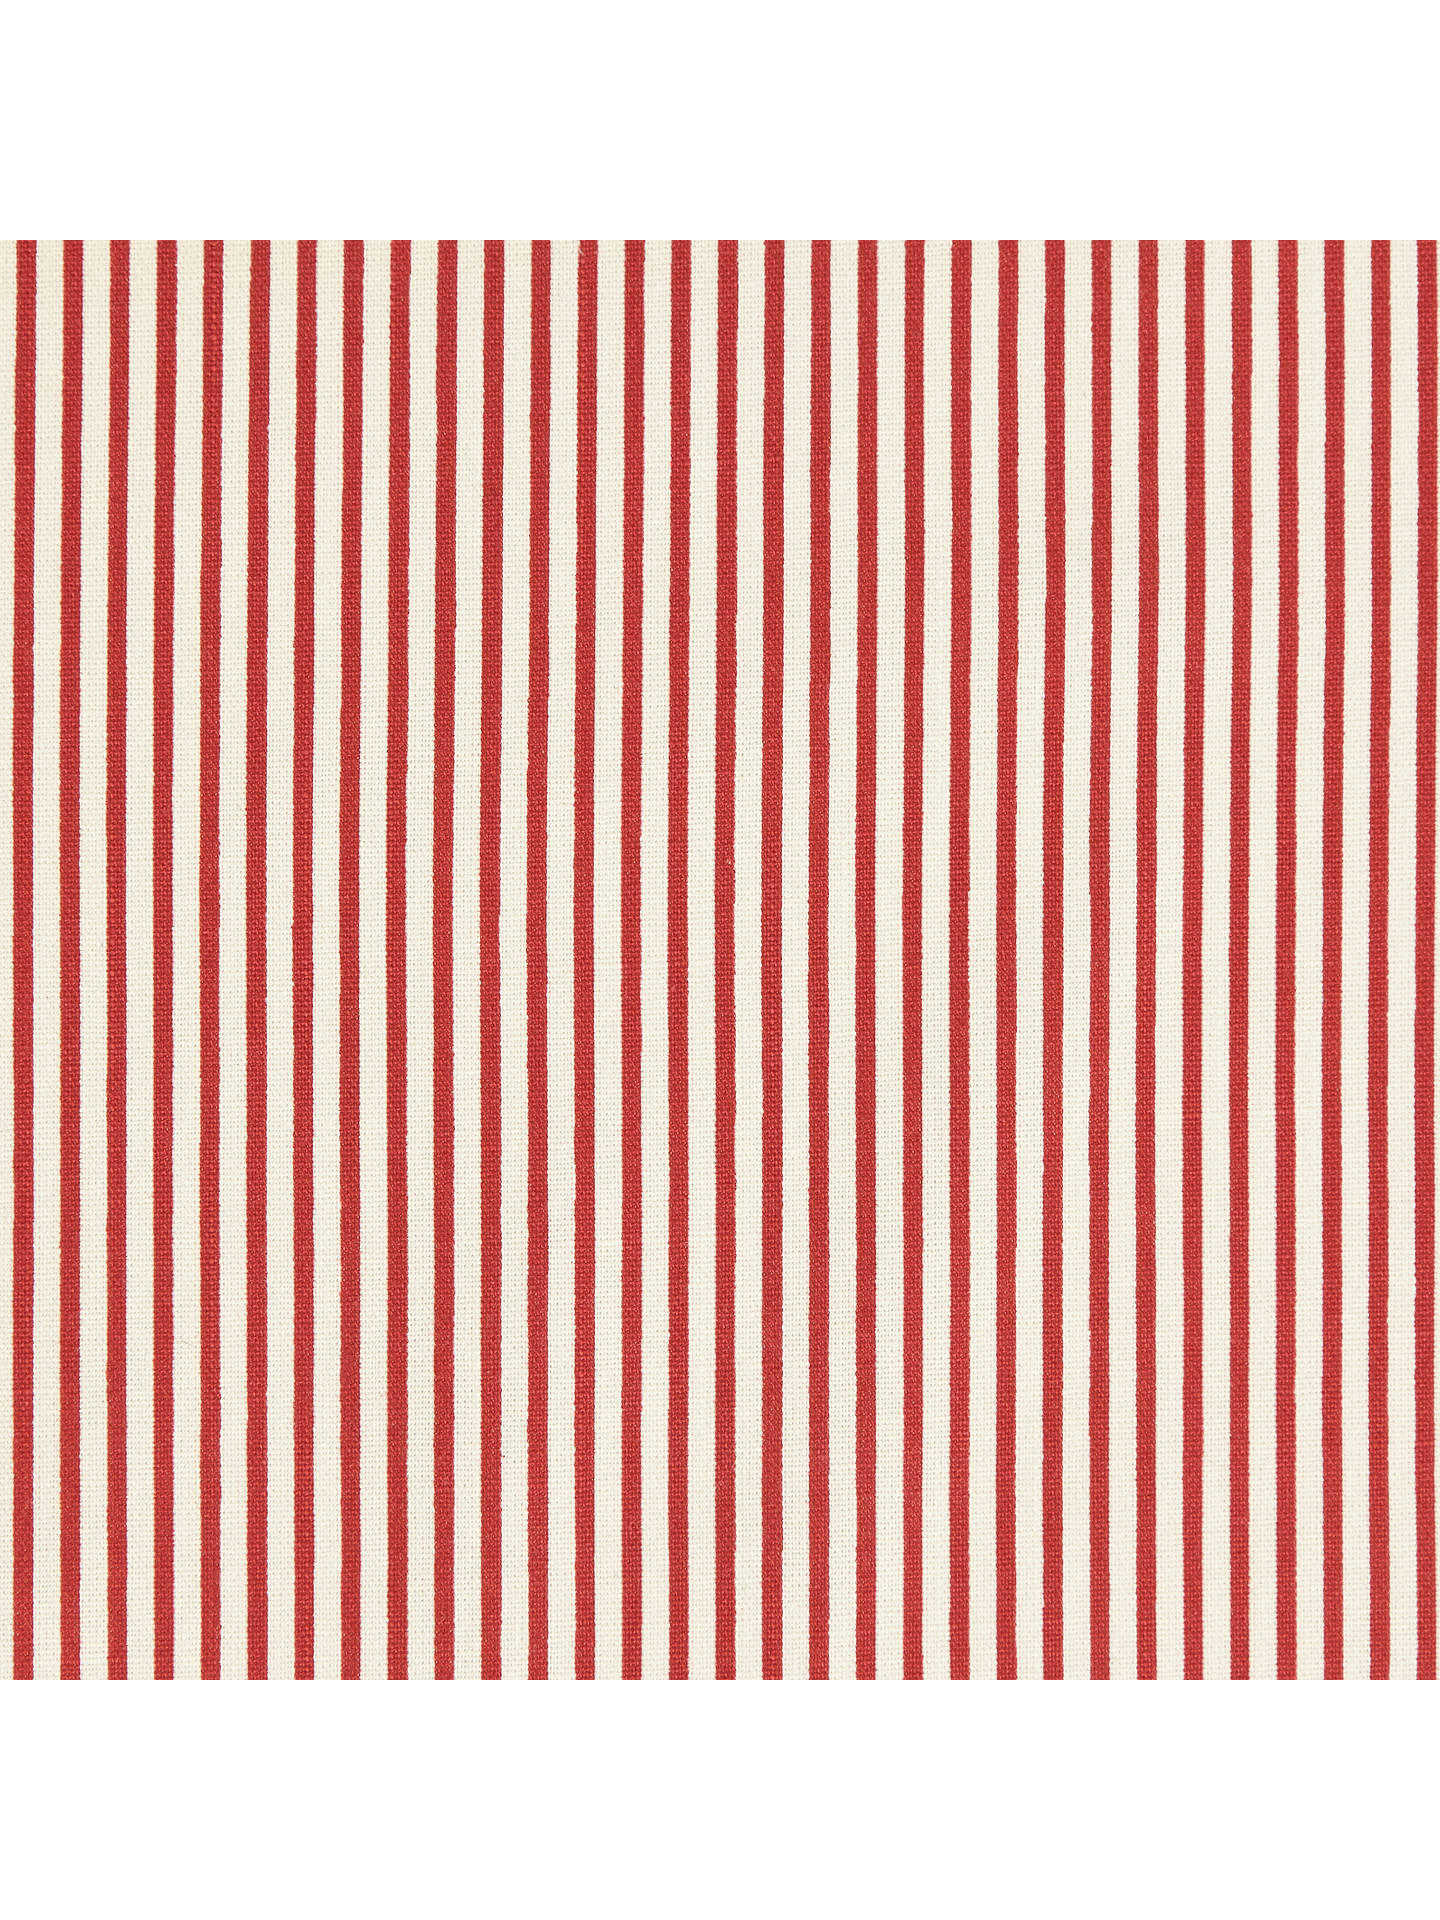 Cotton Stripe Fabric Redwhite At John Lewis Partners